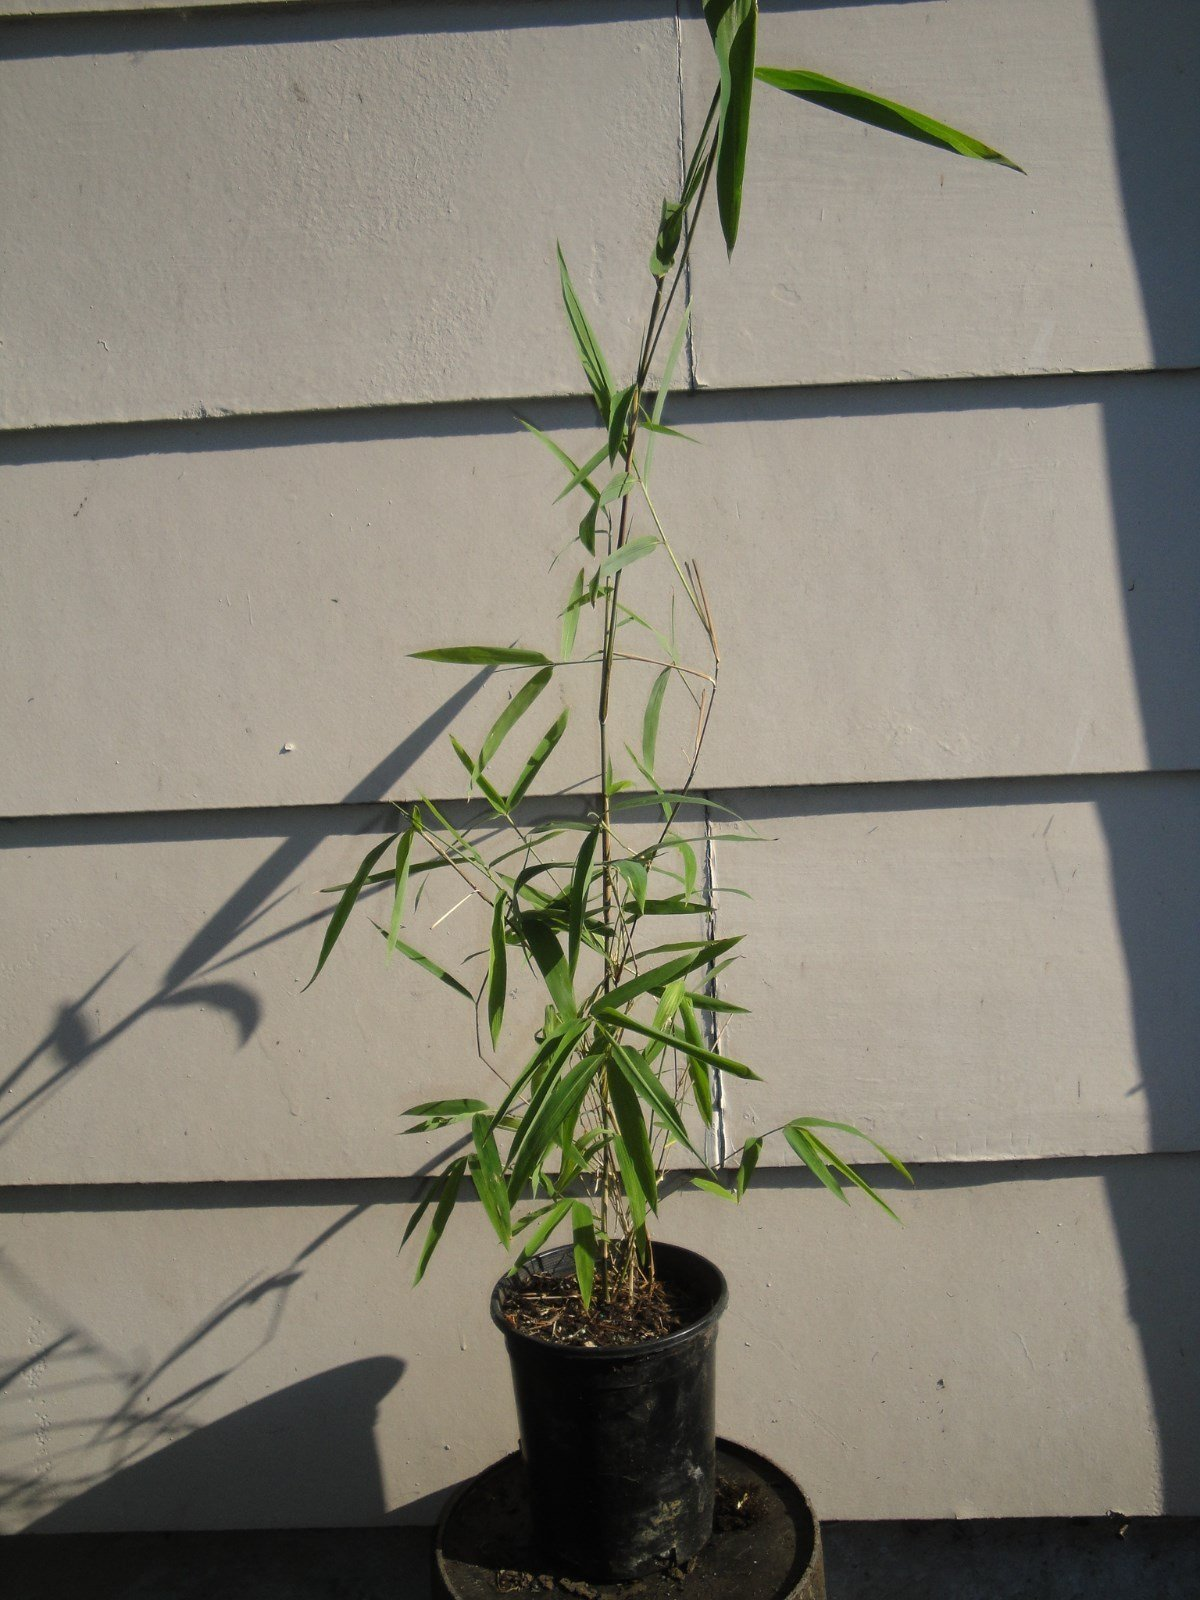 Box of 10 Borinda Macclureana, Live Tibetan Clumping Bamboo, Great Hedge or Specimen. by Maya Gardens, Inc.